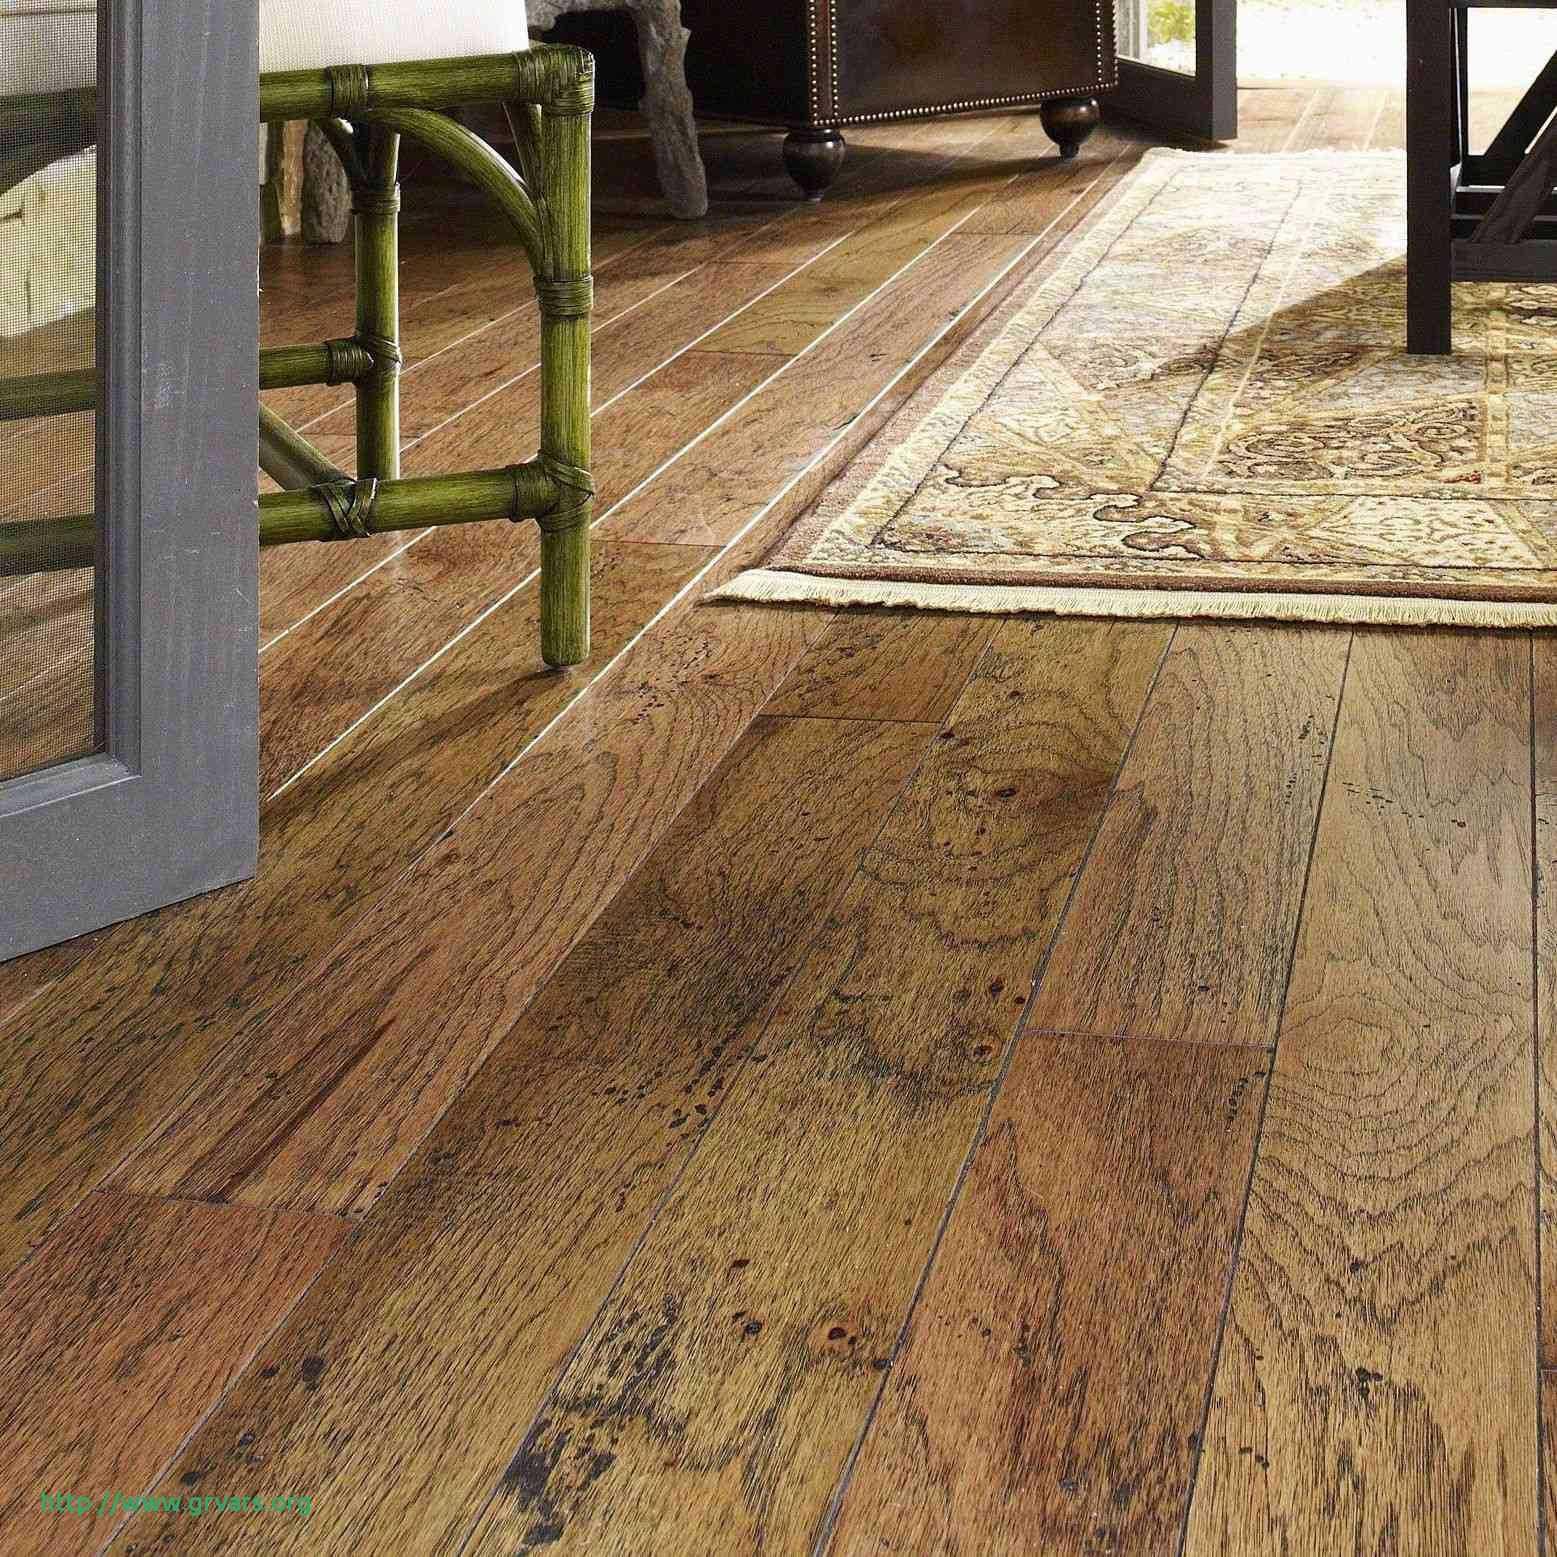 installing hardwood floors over concrete of 19 luxe laying wood floors over concrete ideas blog in hardwood floor designs new best type wood flooring best floor floor wood floor wood 0d putting